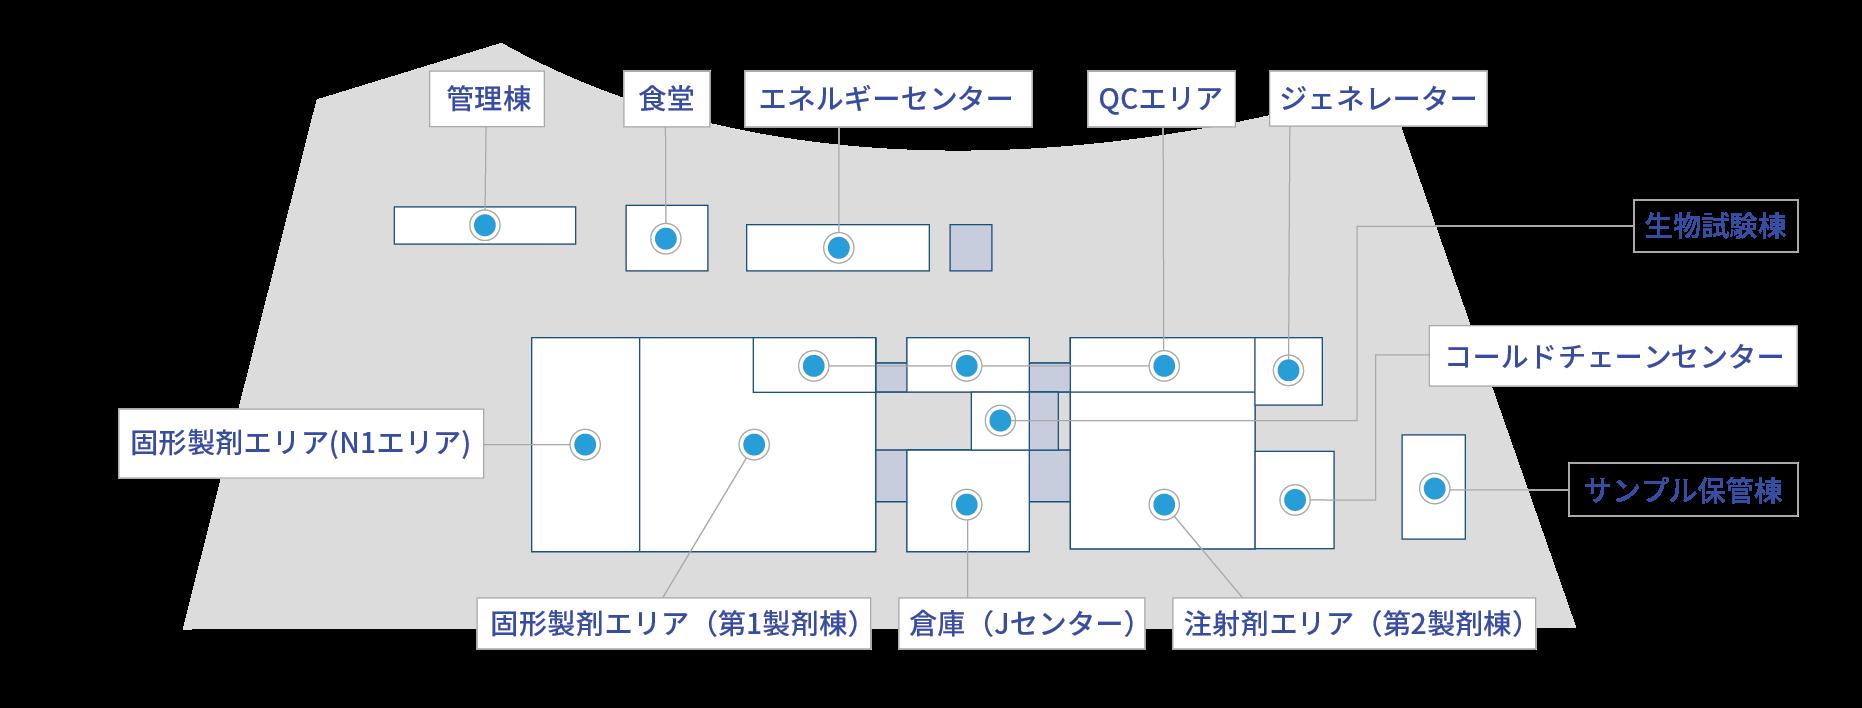 Artboard 2FactoryMapsJP